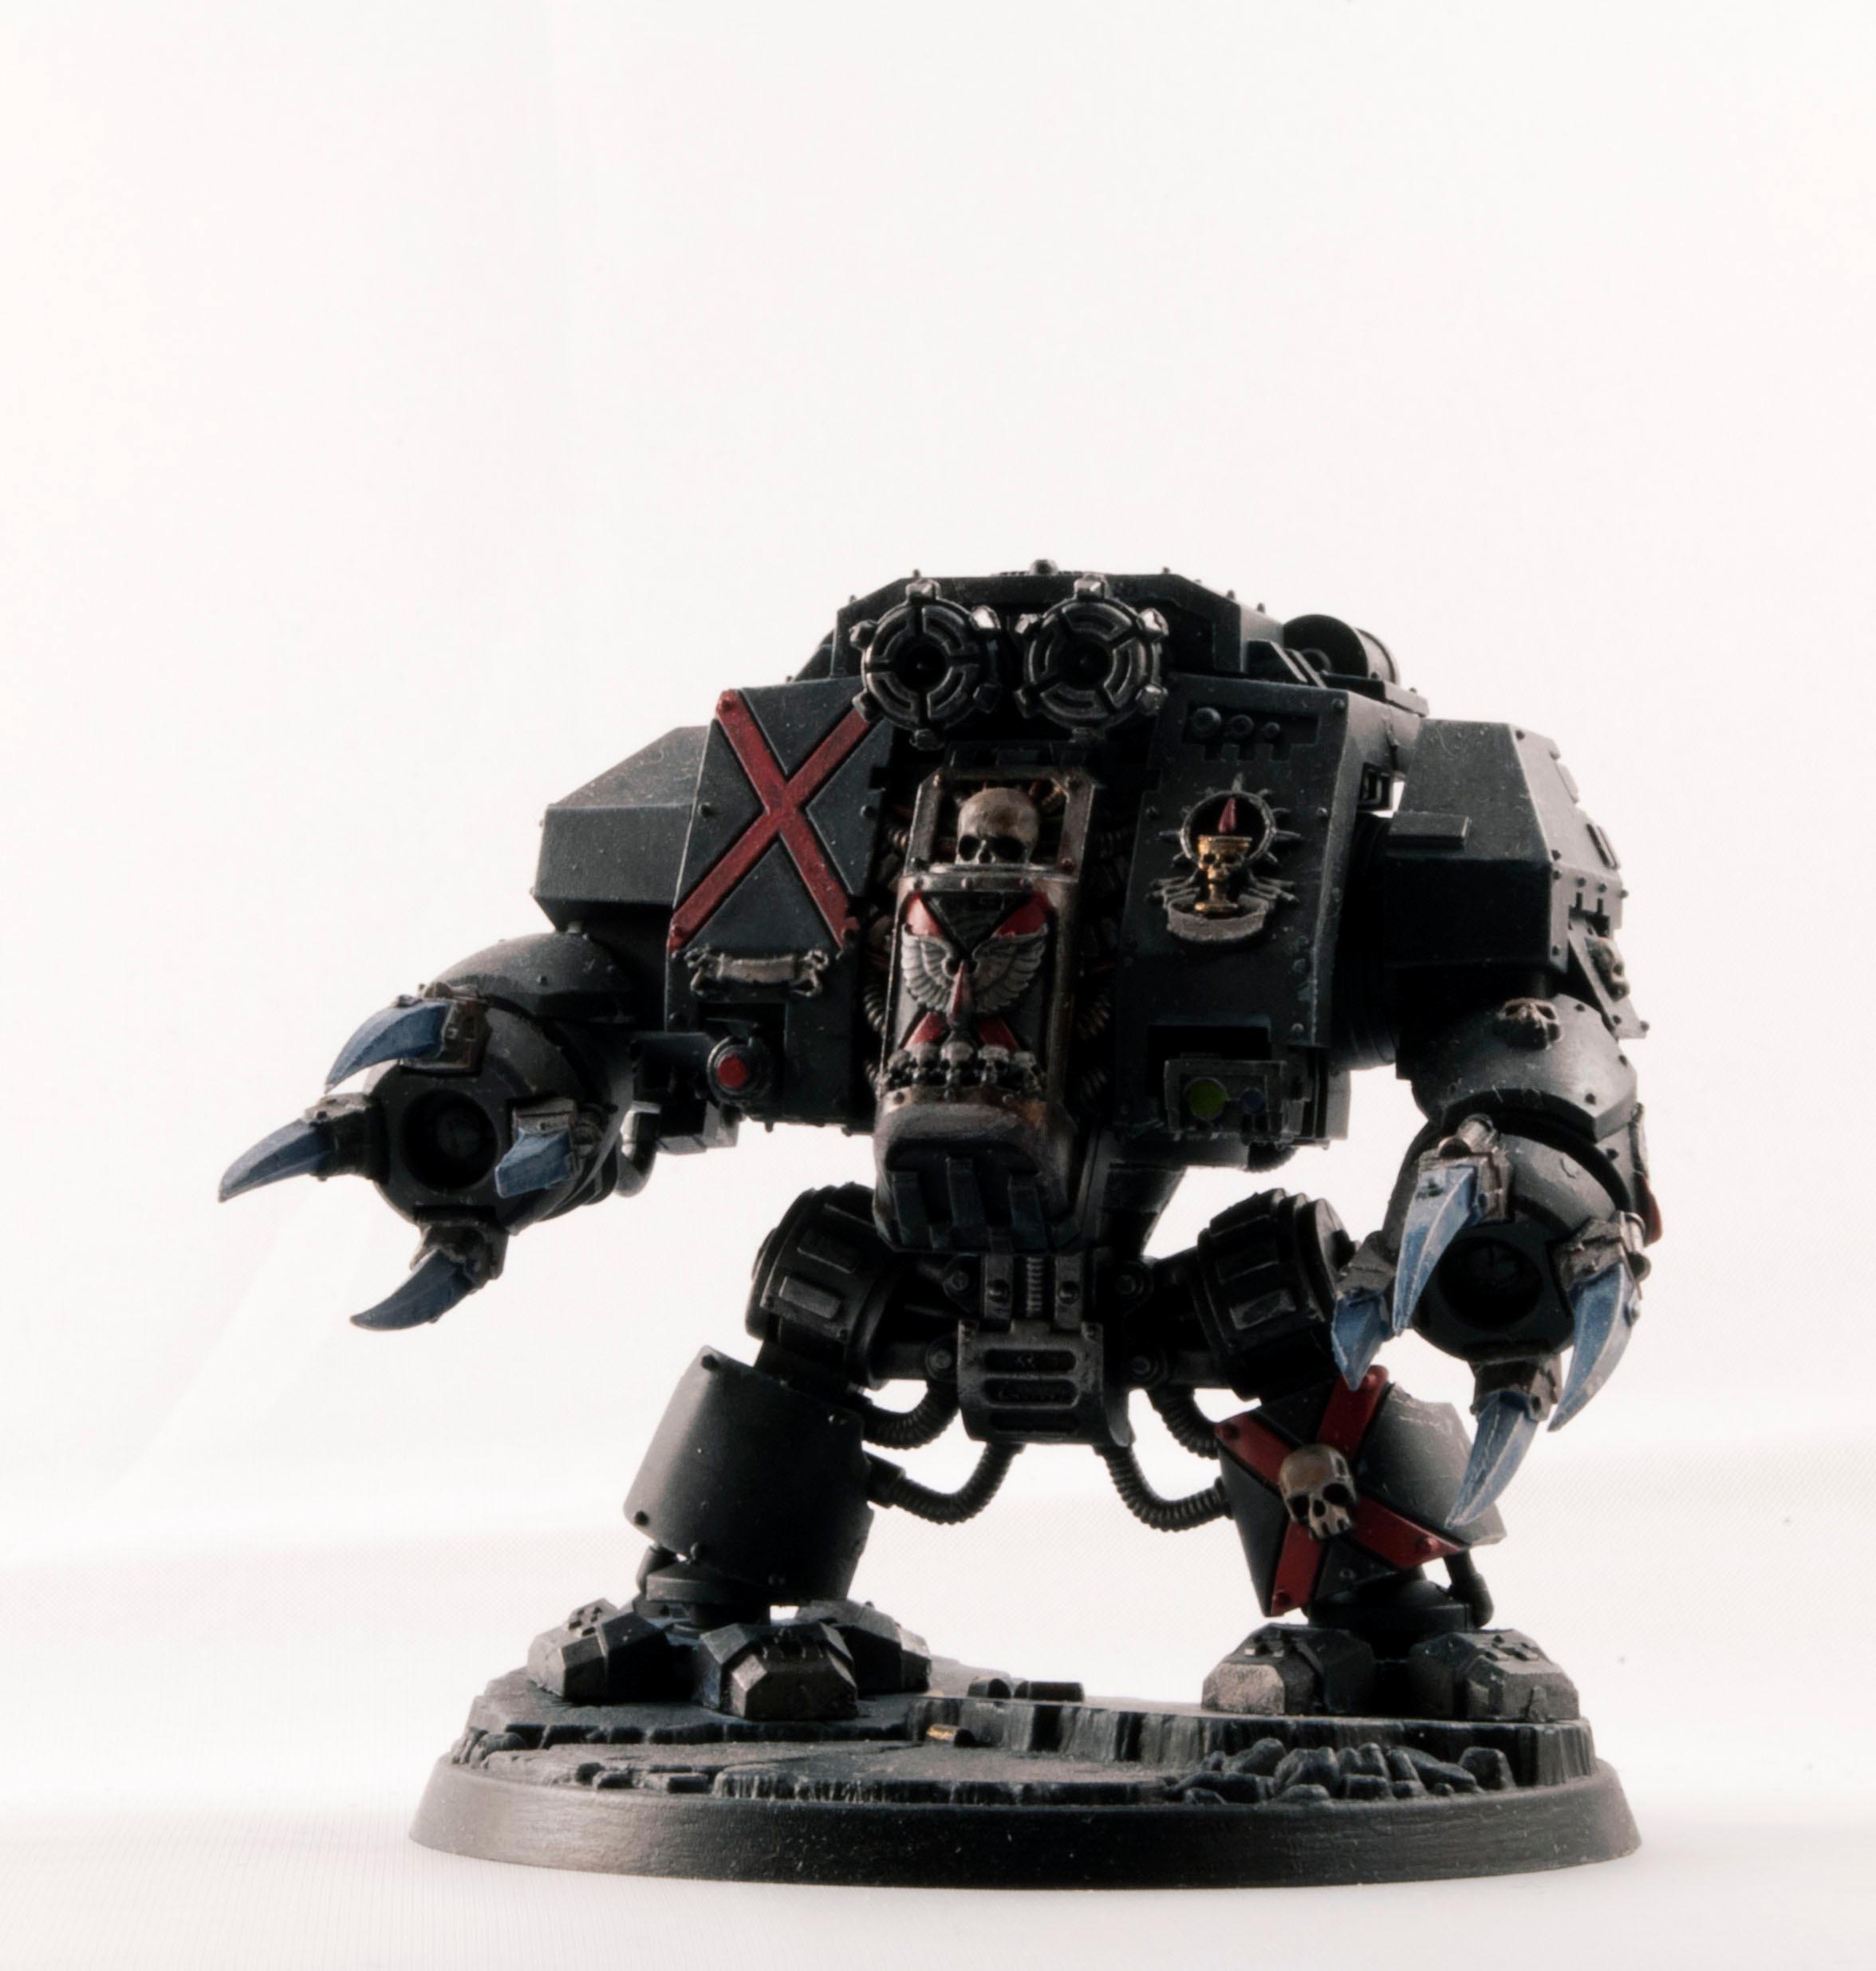 Blood Angels, Death Company, Dreadnought, Power Hug, Space Marines, Warhammer 40,000